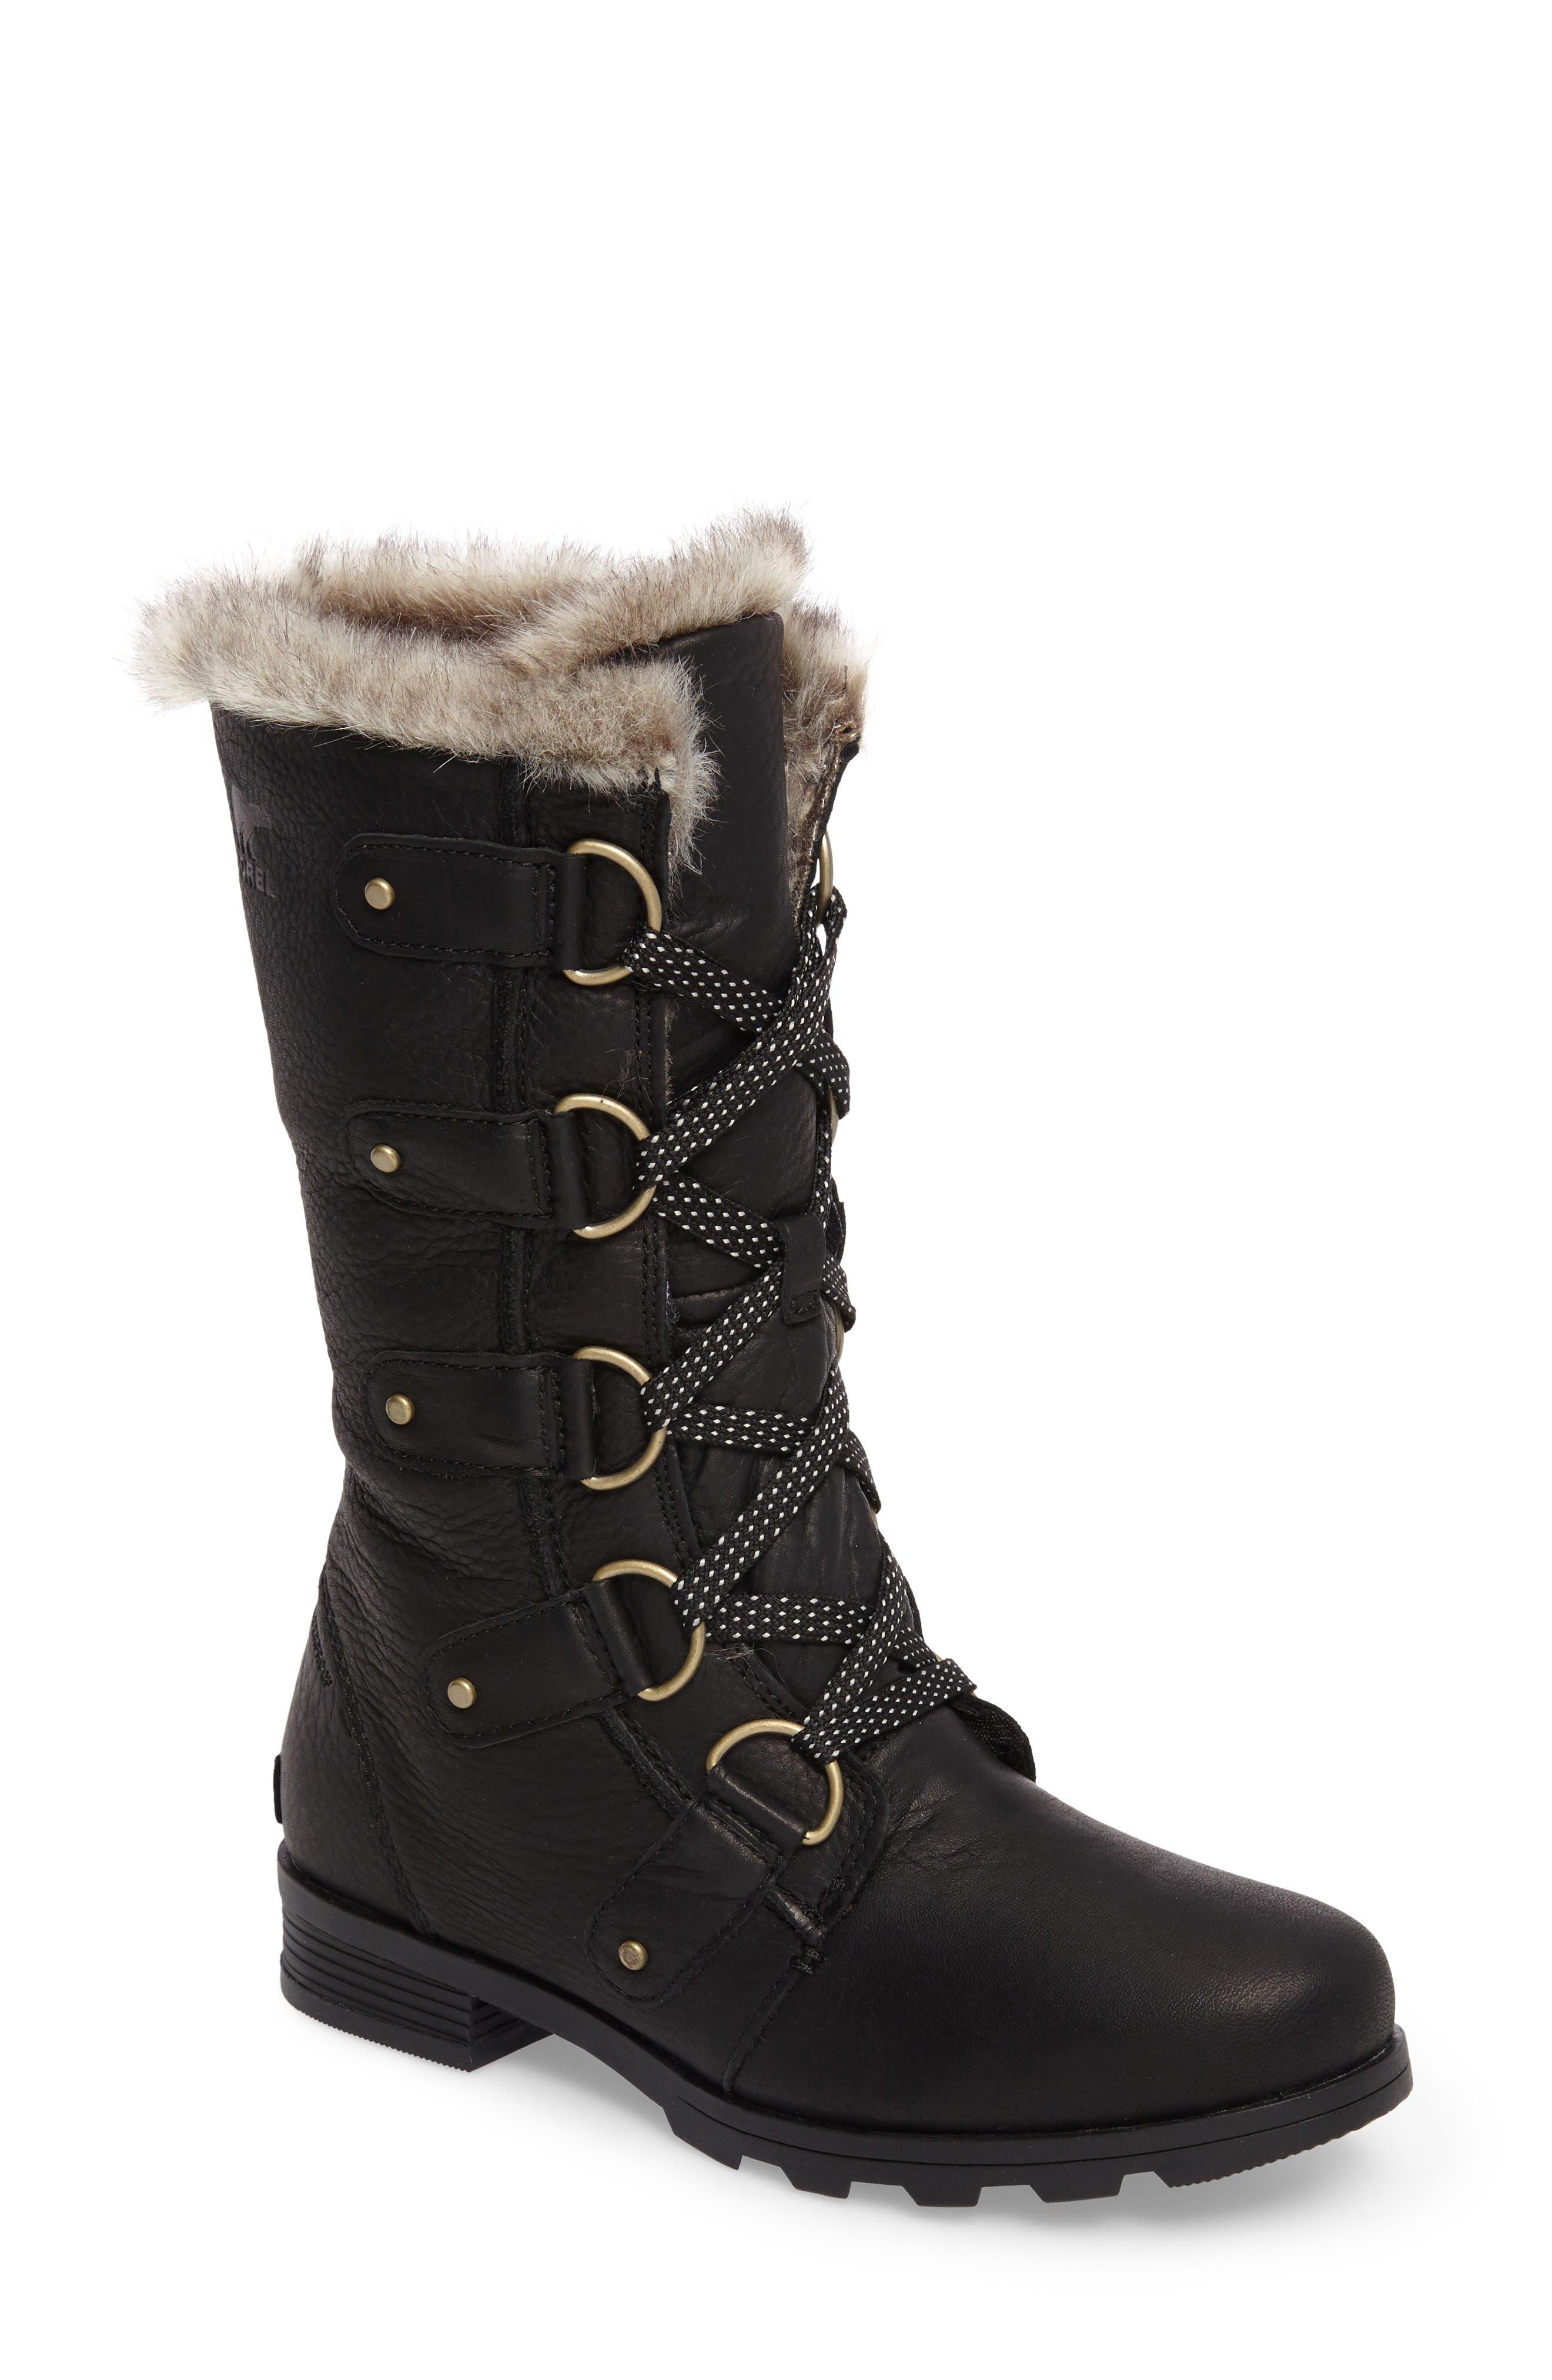 SOREL Emelie Waterproof Lace Up Boot with Faux Fur Trim (Women)